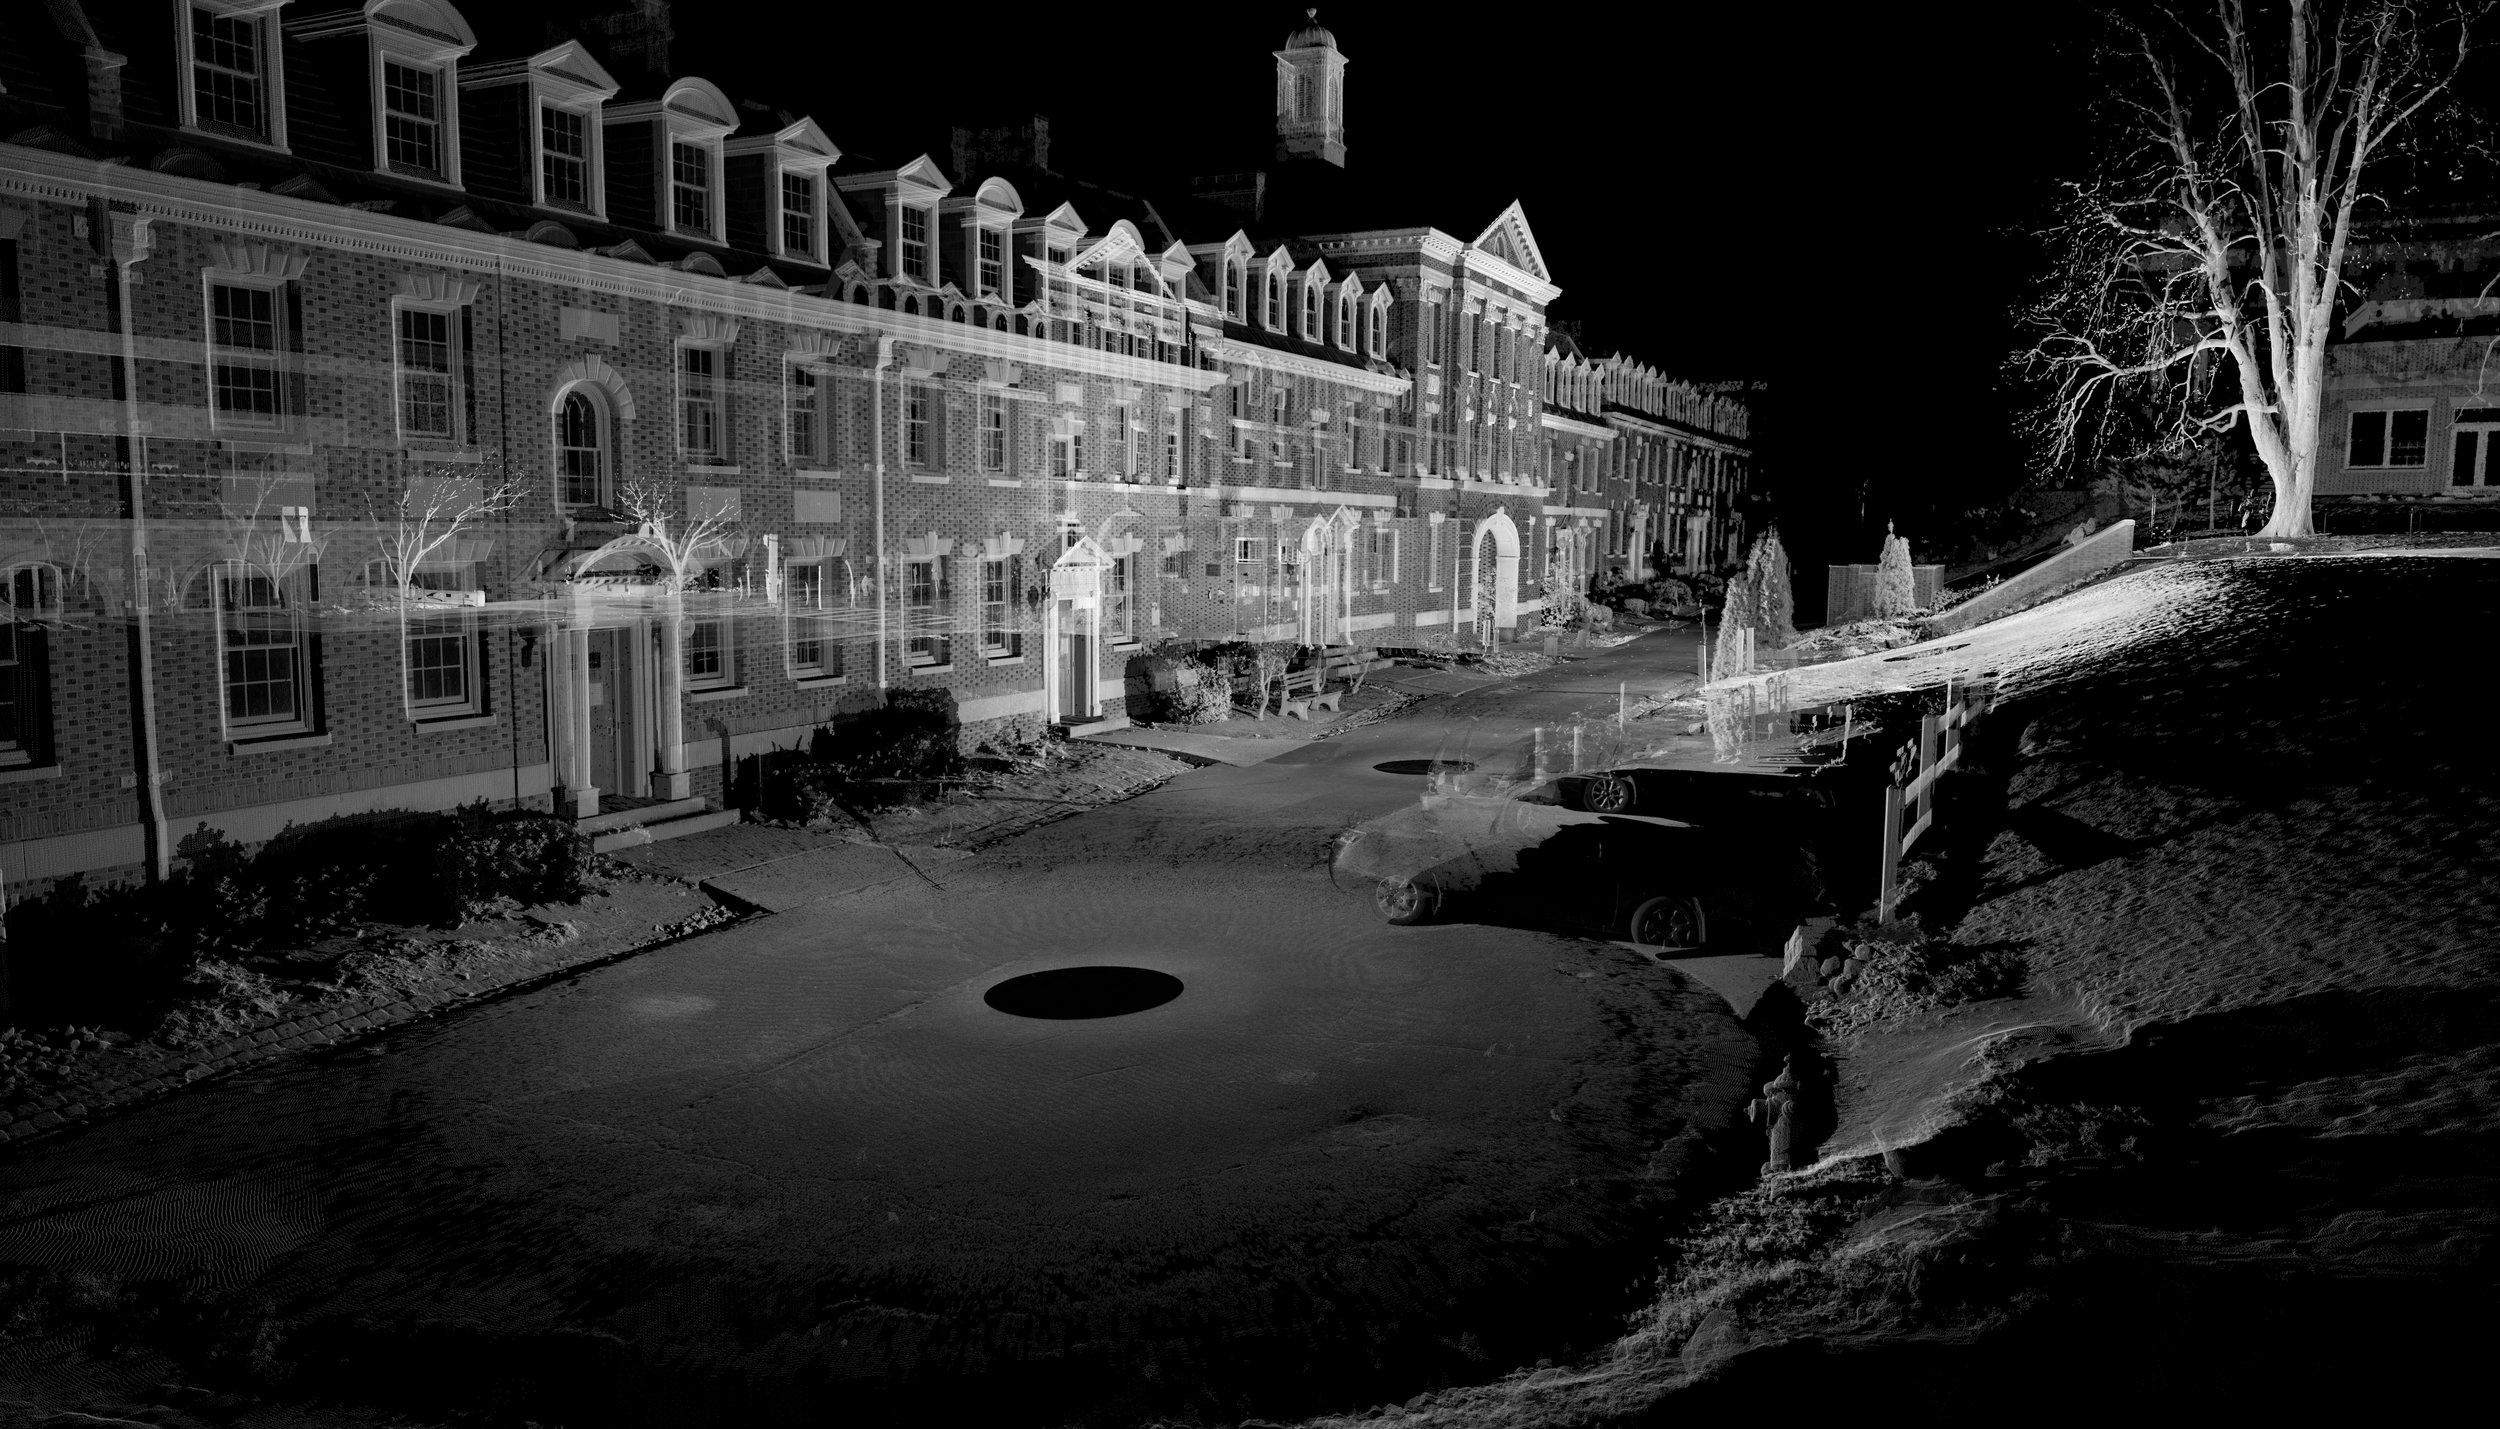 MYNDWORKSHOP_rensselaer-polytechnic-institute-3D-laser-scanning-point-cloud-new-york-DORMS.jpg